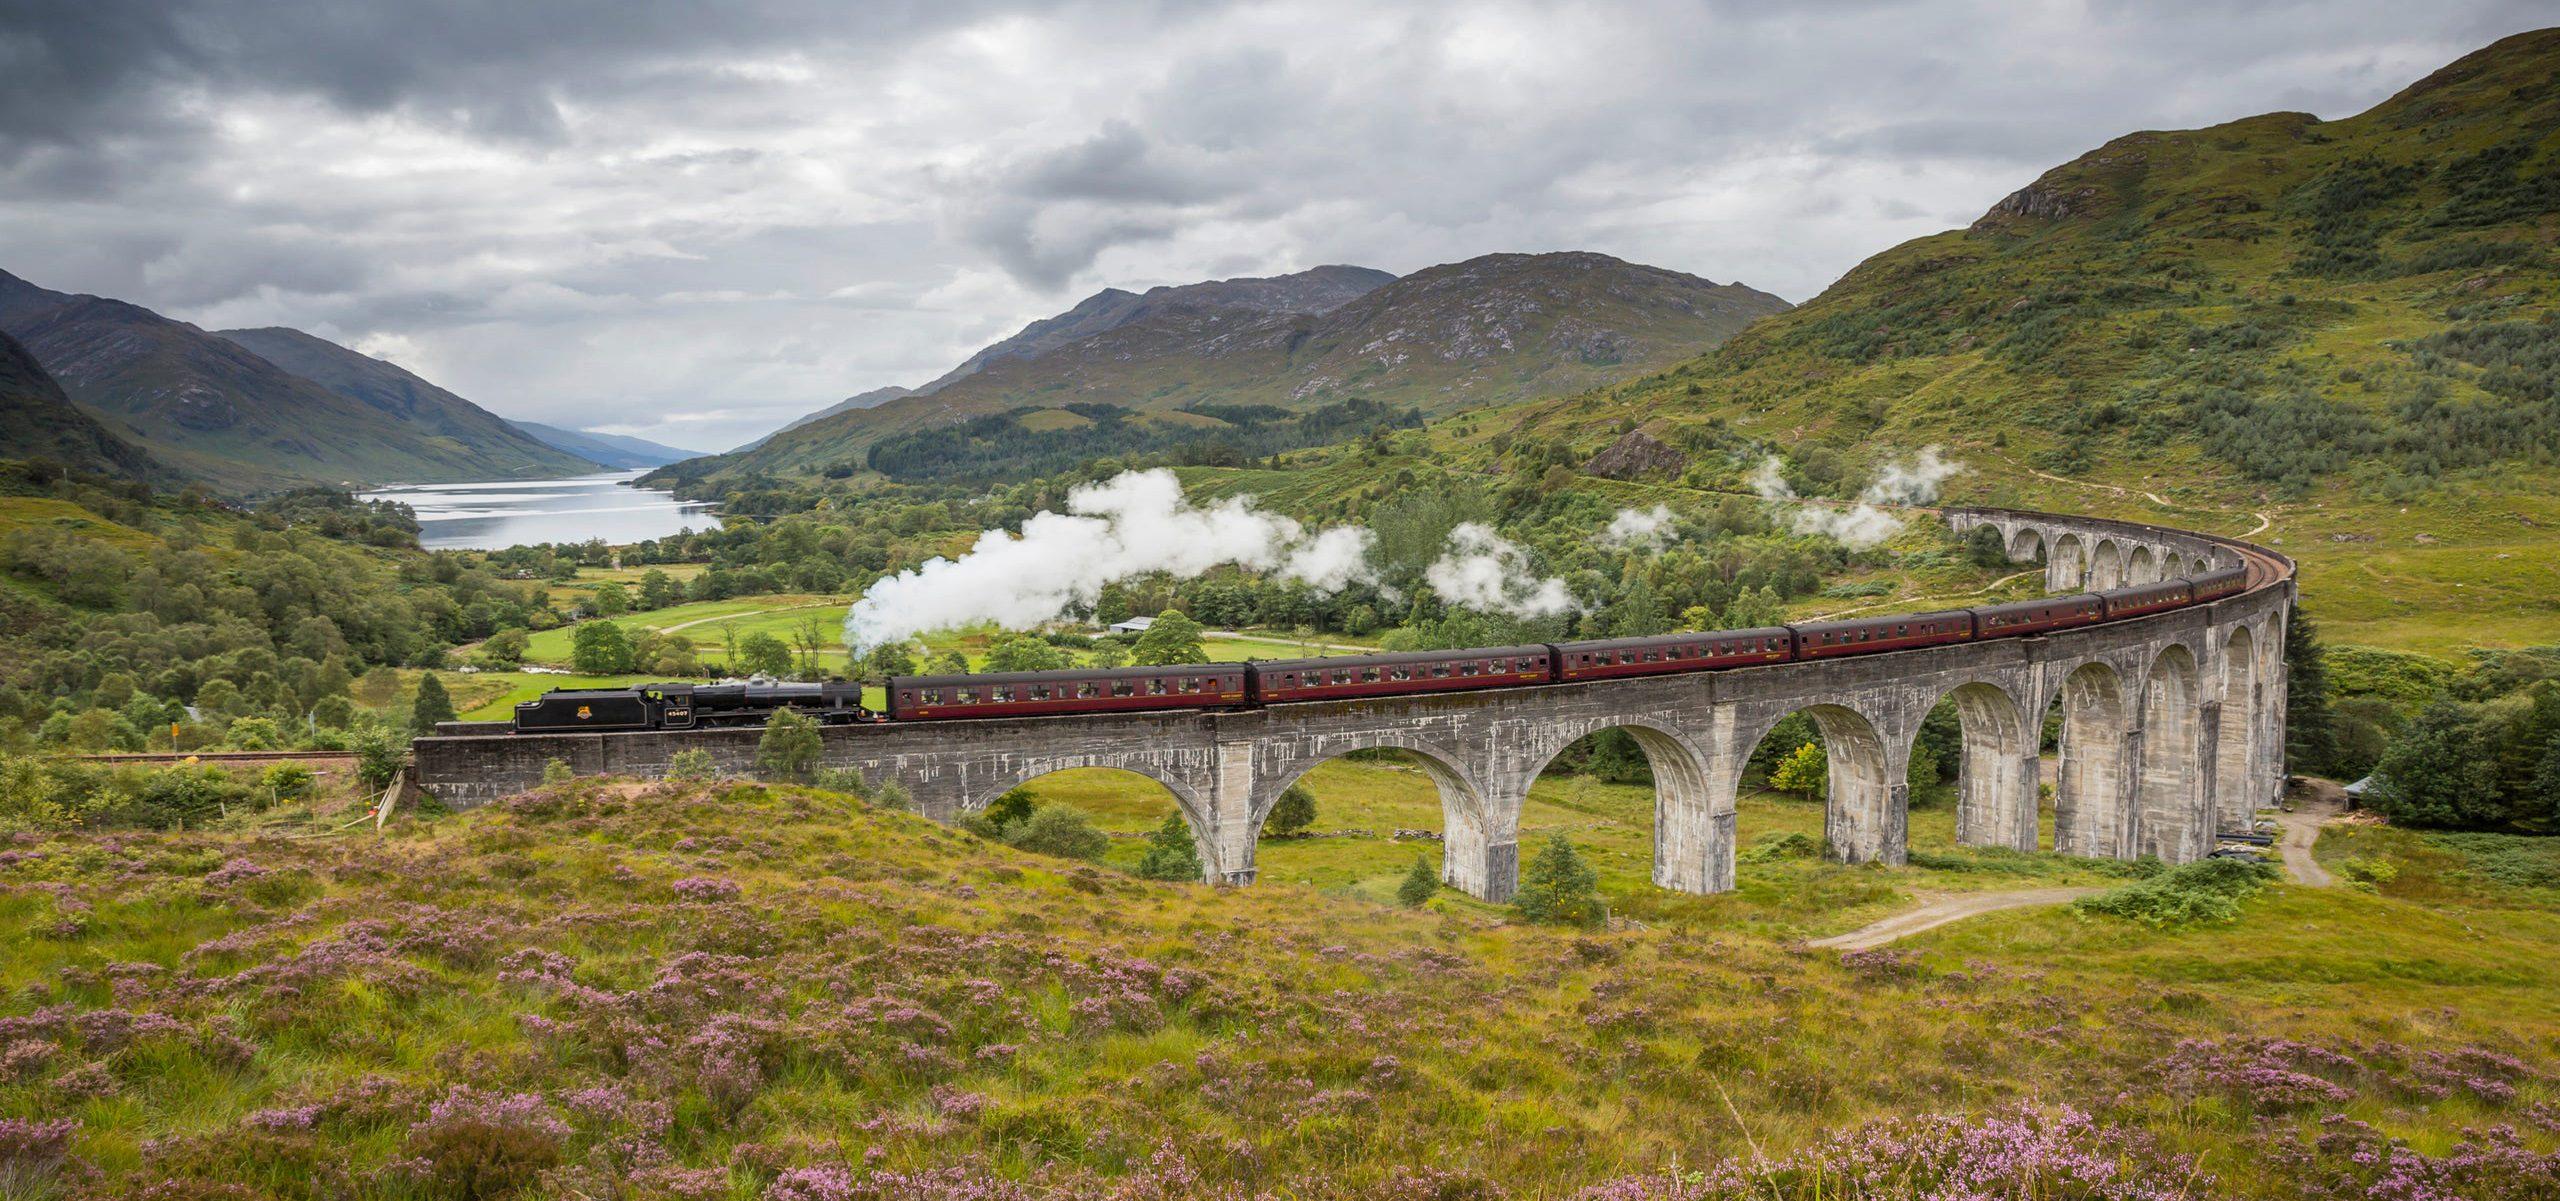 Scotland - Steam Train